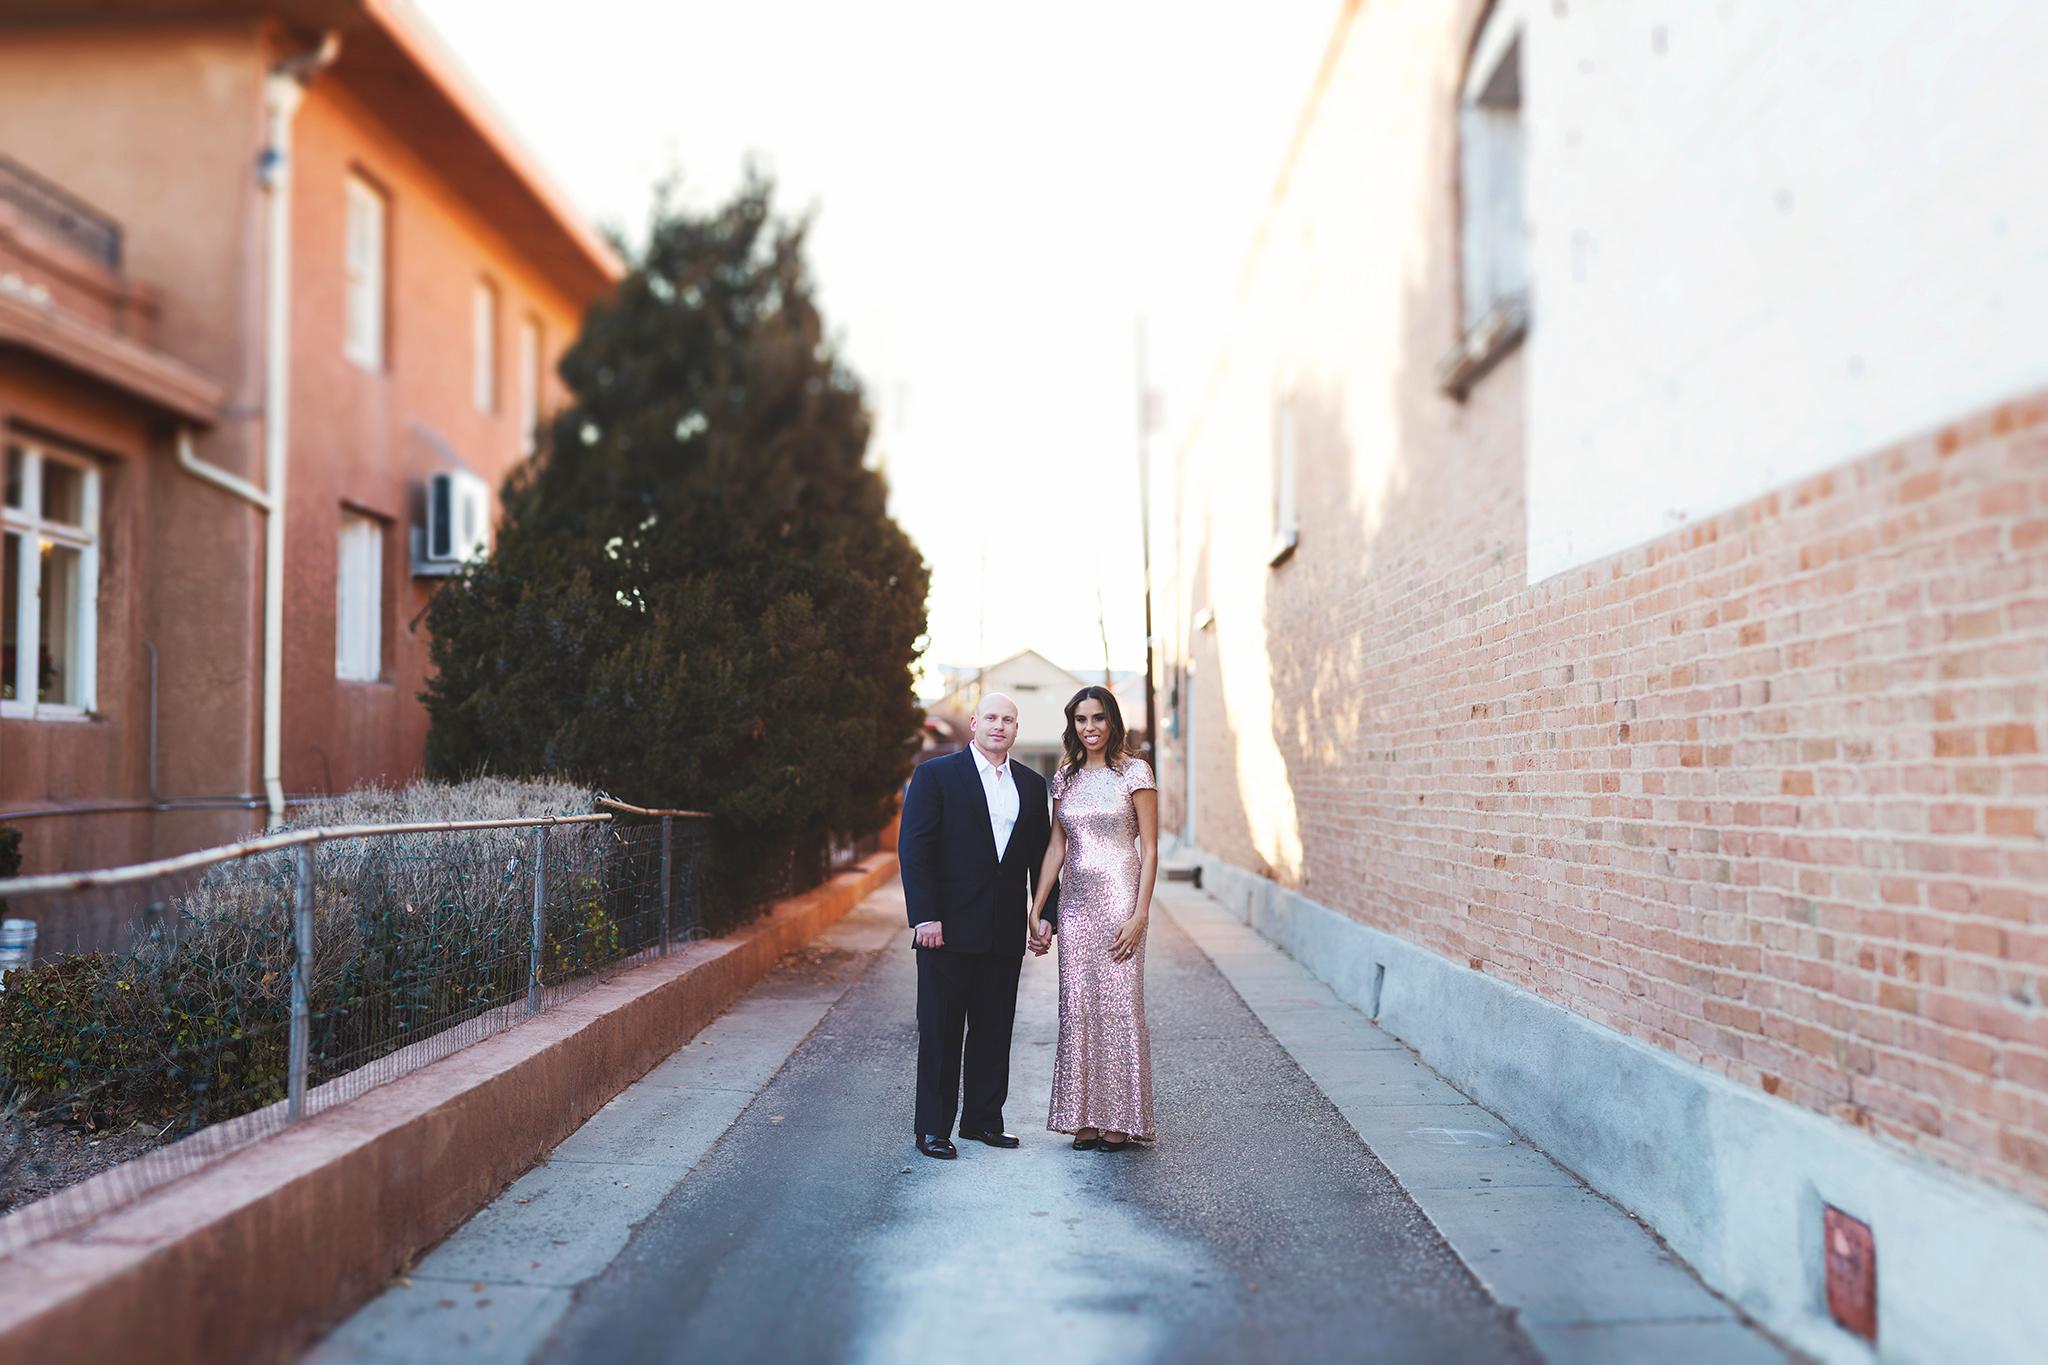 Old Town Albuquerque Elopement | New Mexico Wedding | Liz Anne Photography 15.jpg